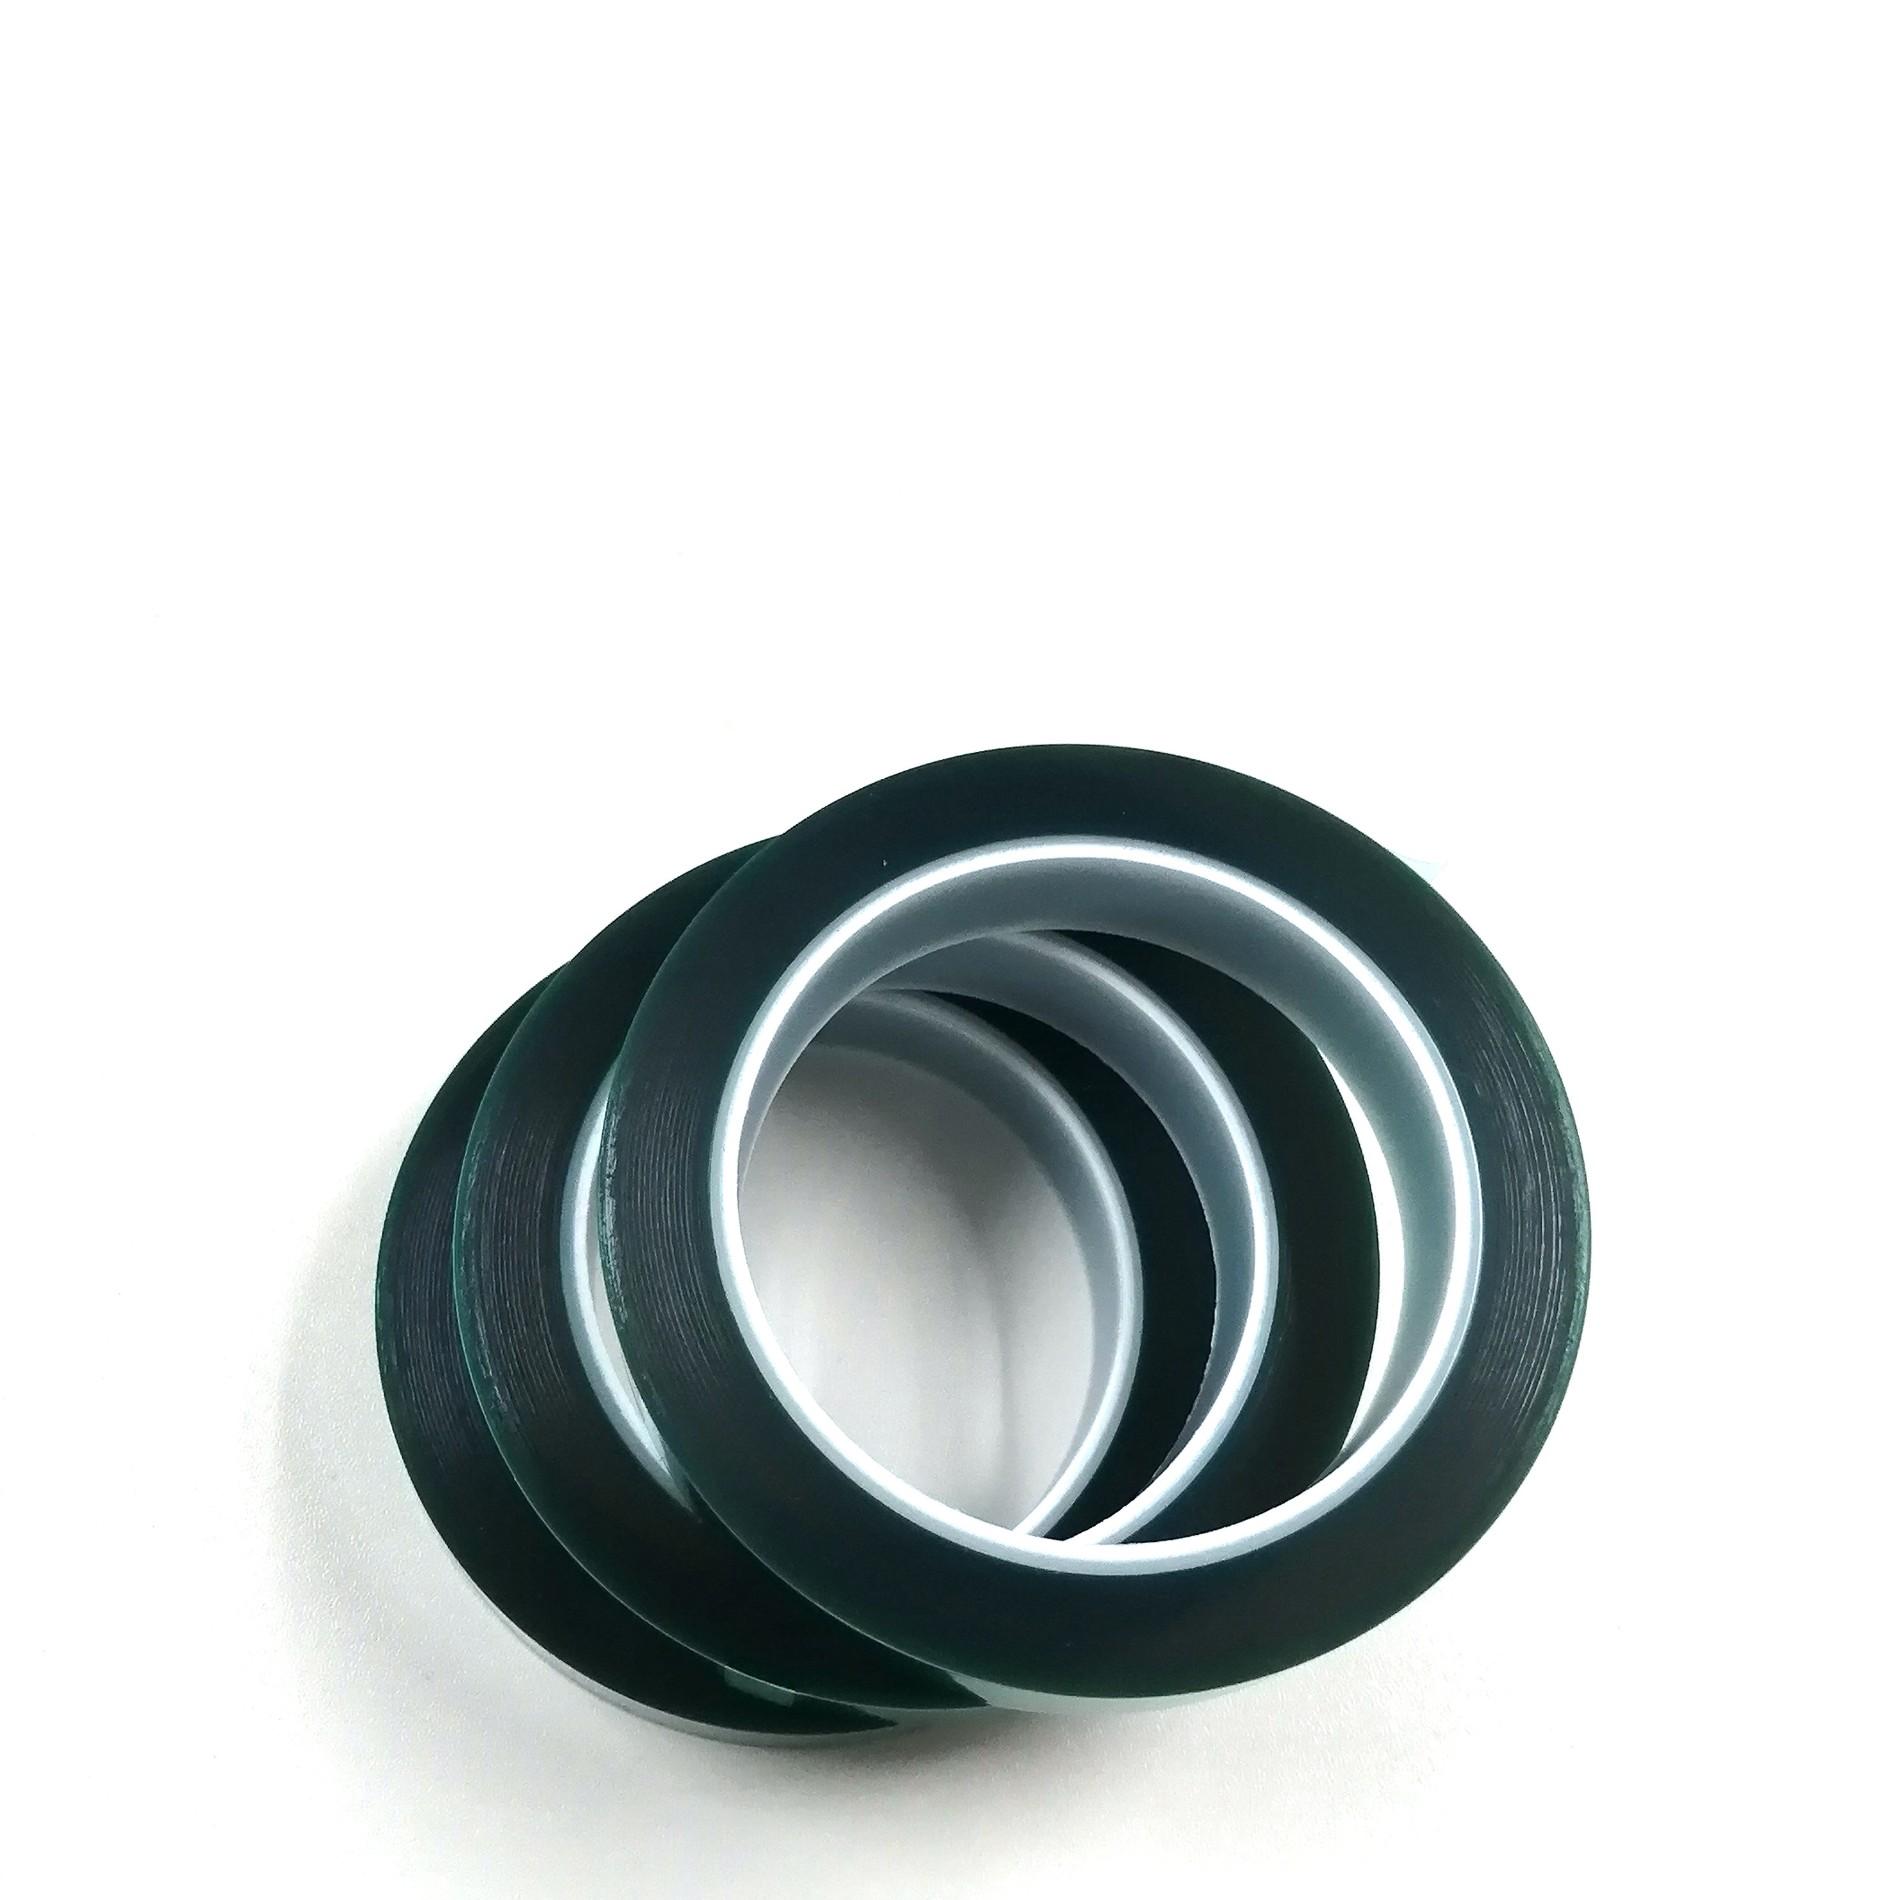 55 micron high temperature silicone adhesive green PET tape Manufacturers, 55 micron high temperature silicone adhesive green PET tape Factory, Supply 55 micron high temperature silicone adhesive green PET tape